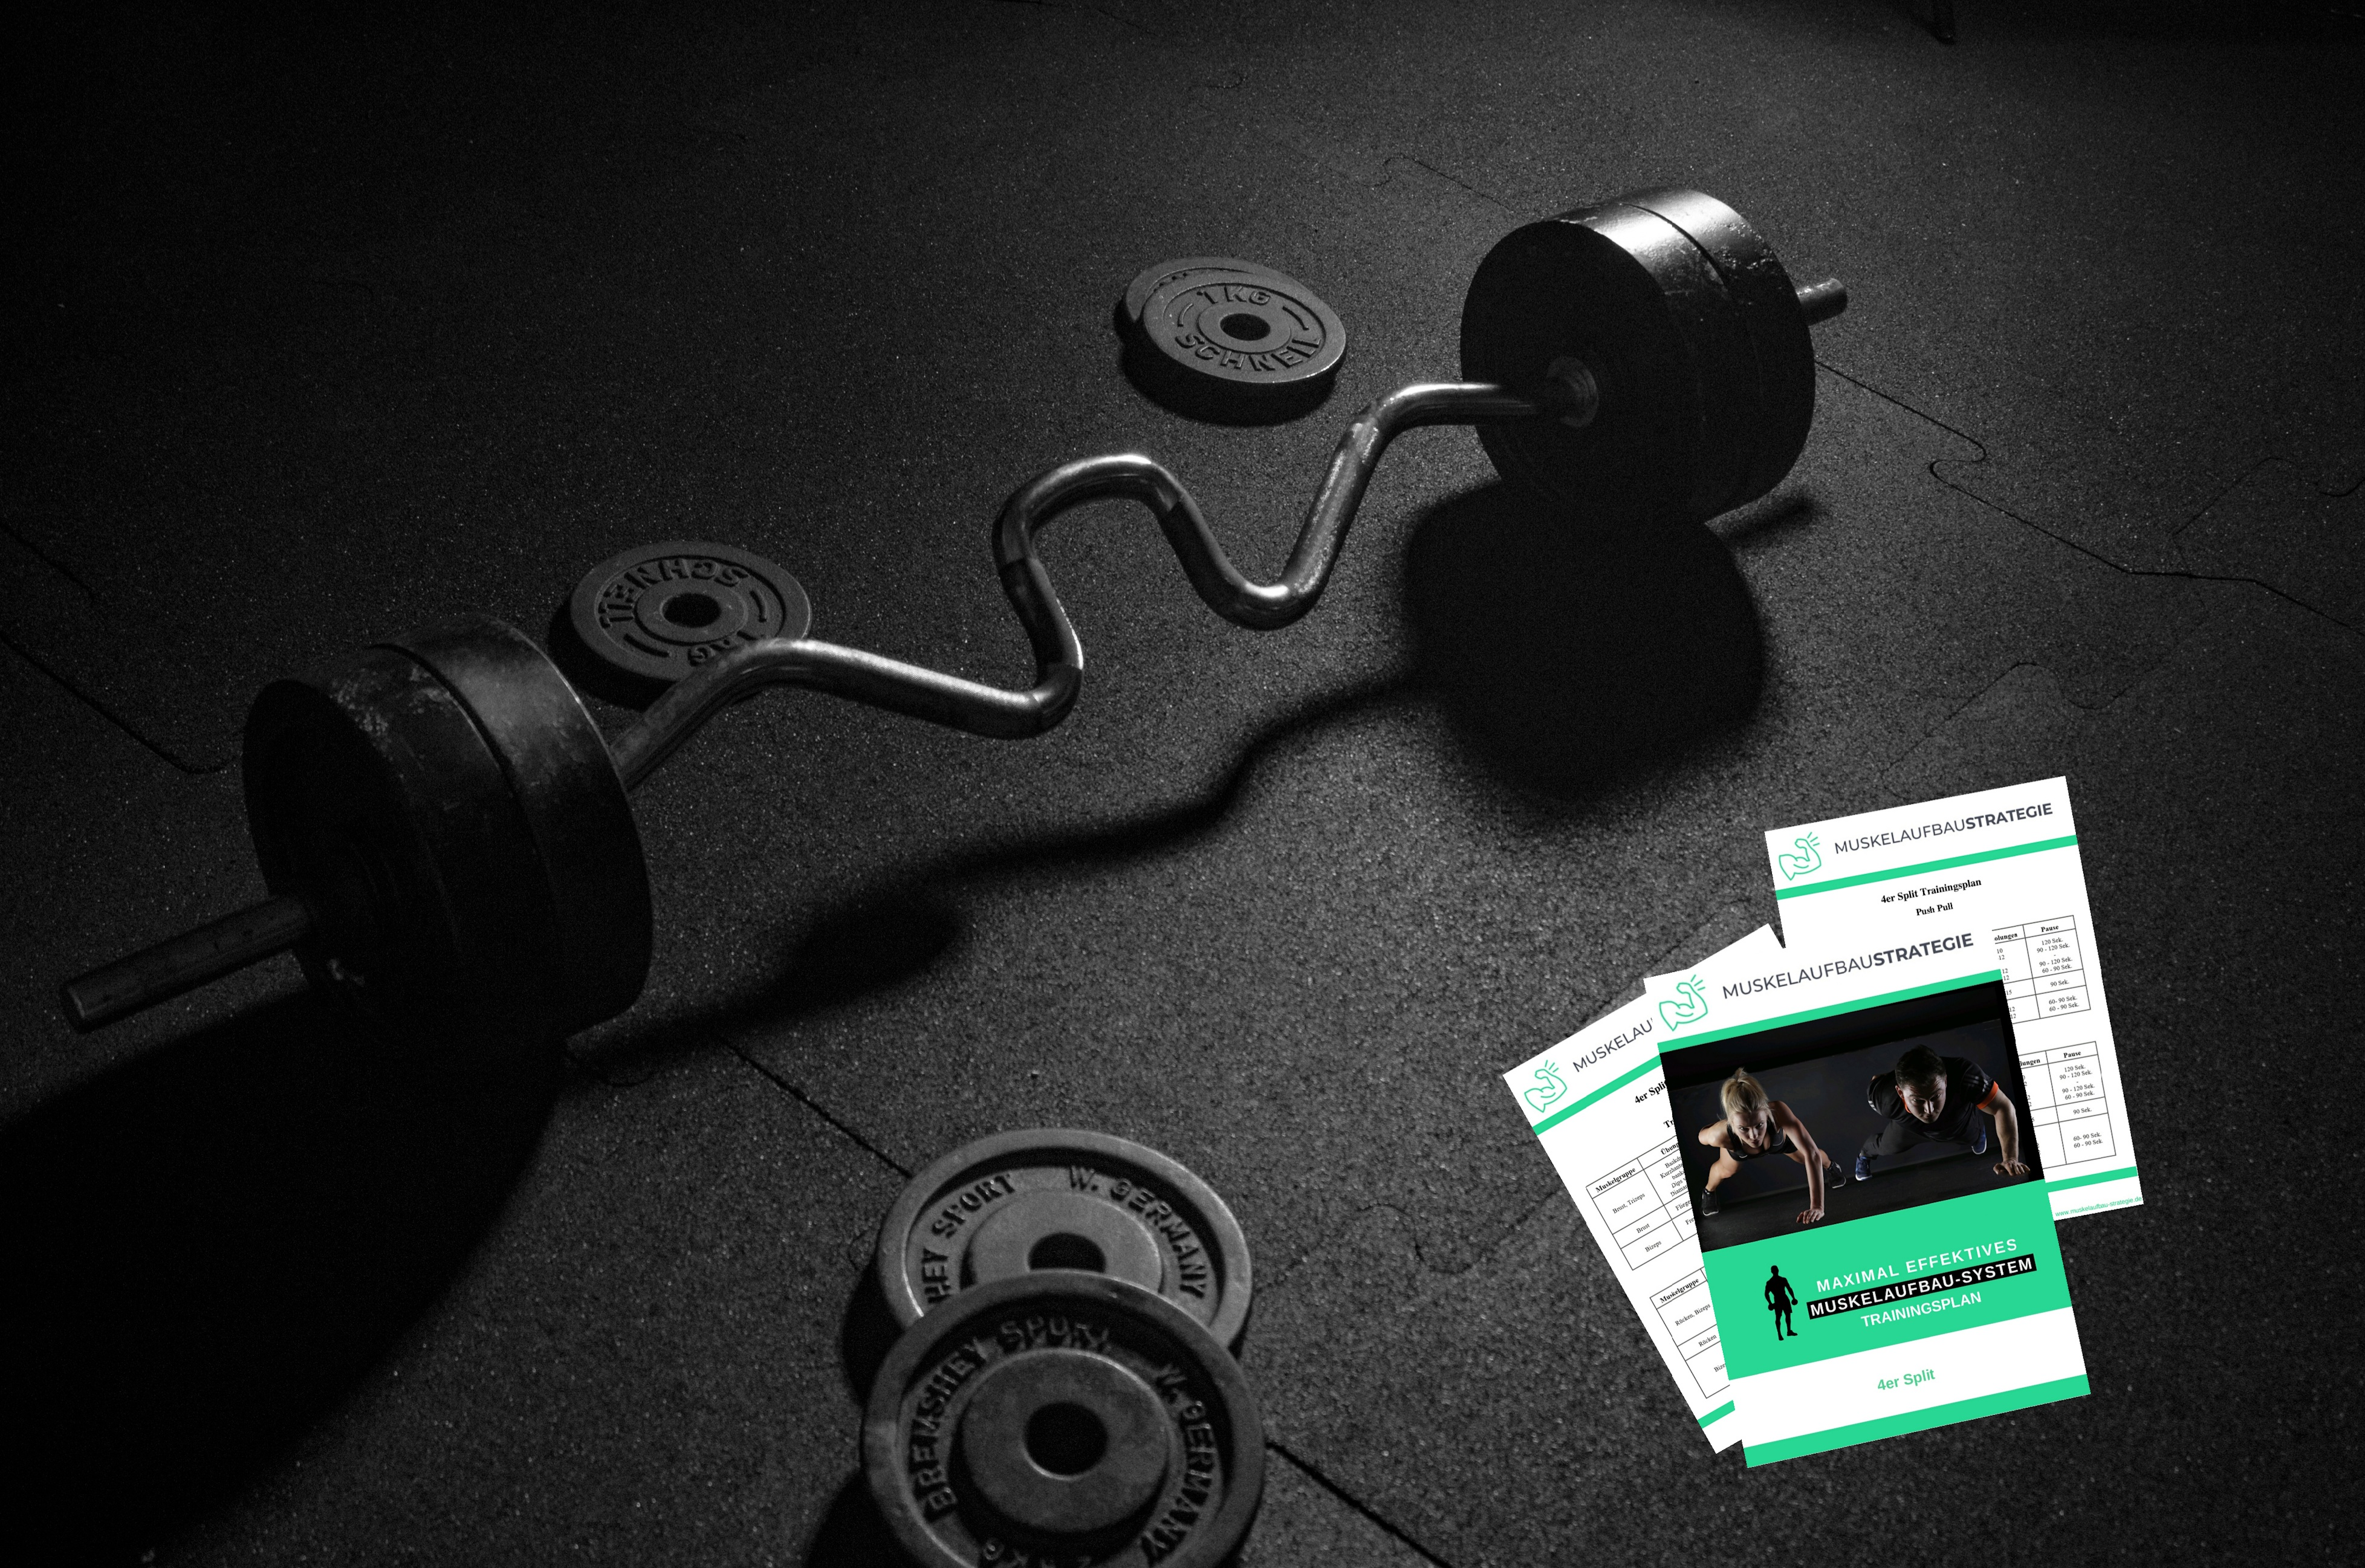 Trainingsplan, Trainingsplanung, Hantel, Gewichte